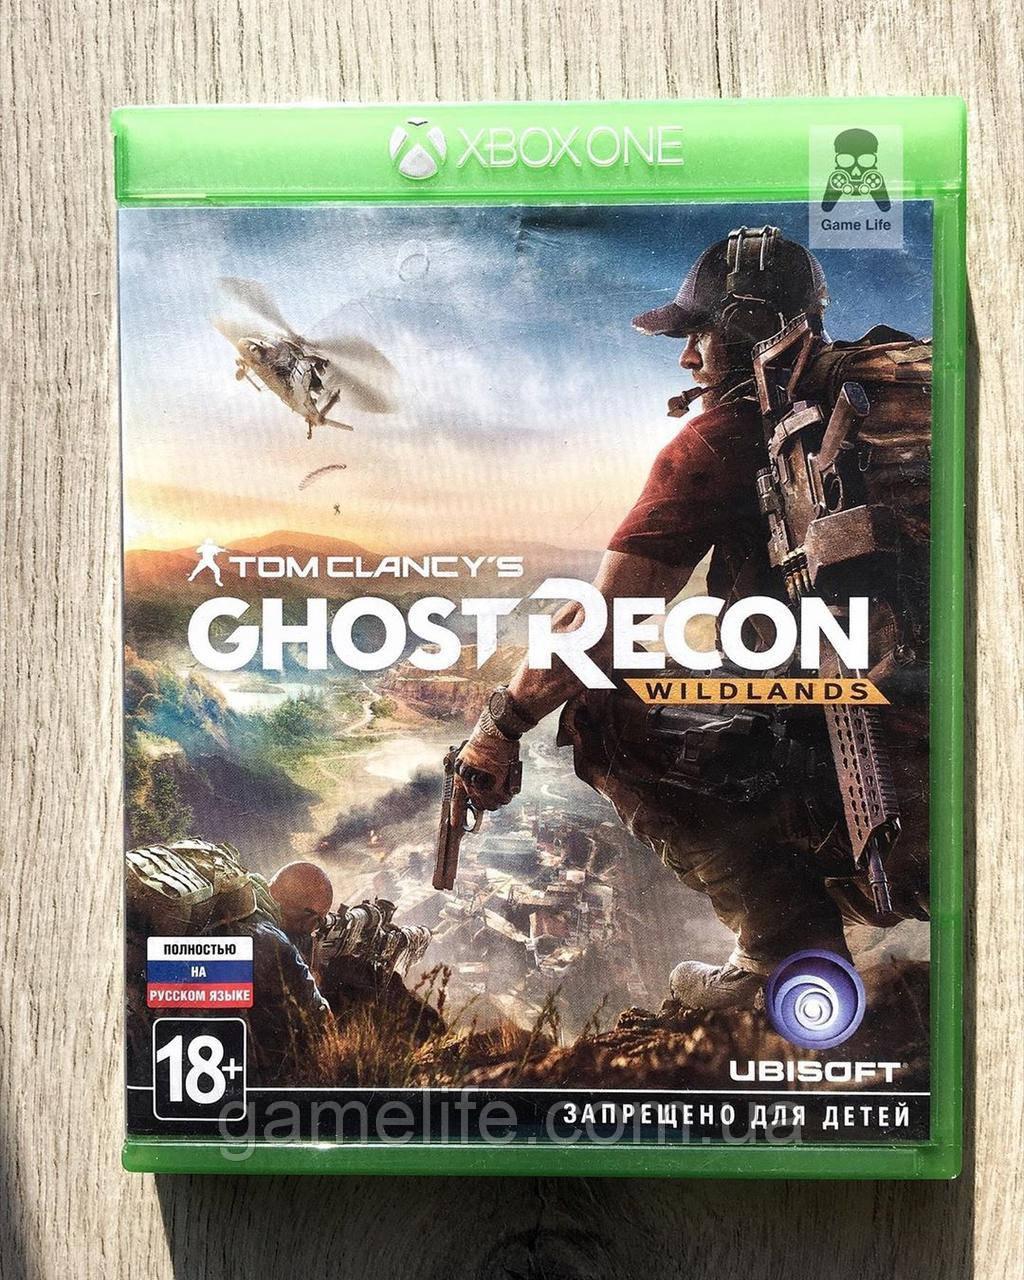 Tom Clancy's Ghost Recon Wildlands (рус.) (б/у) Xbox One